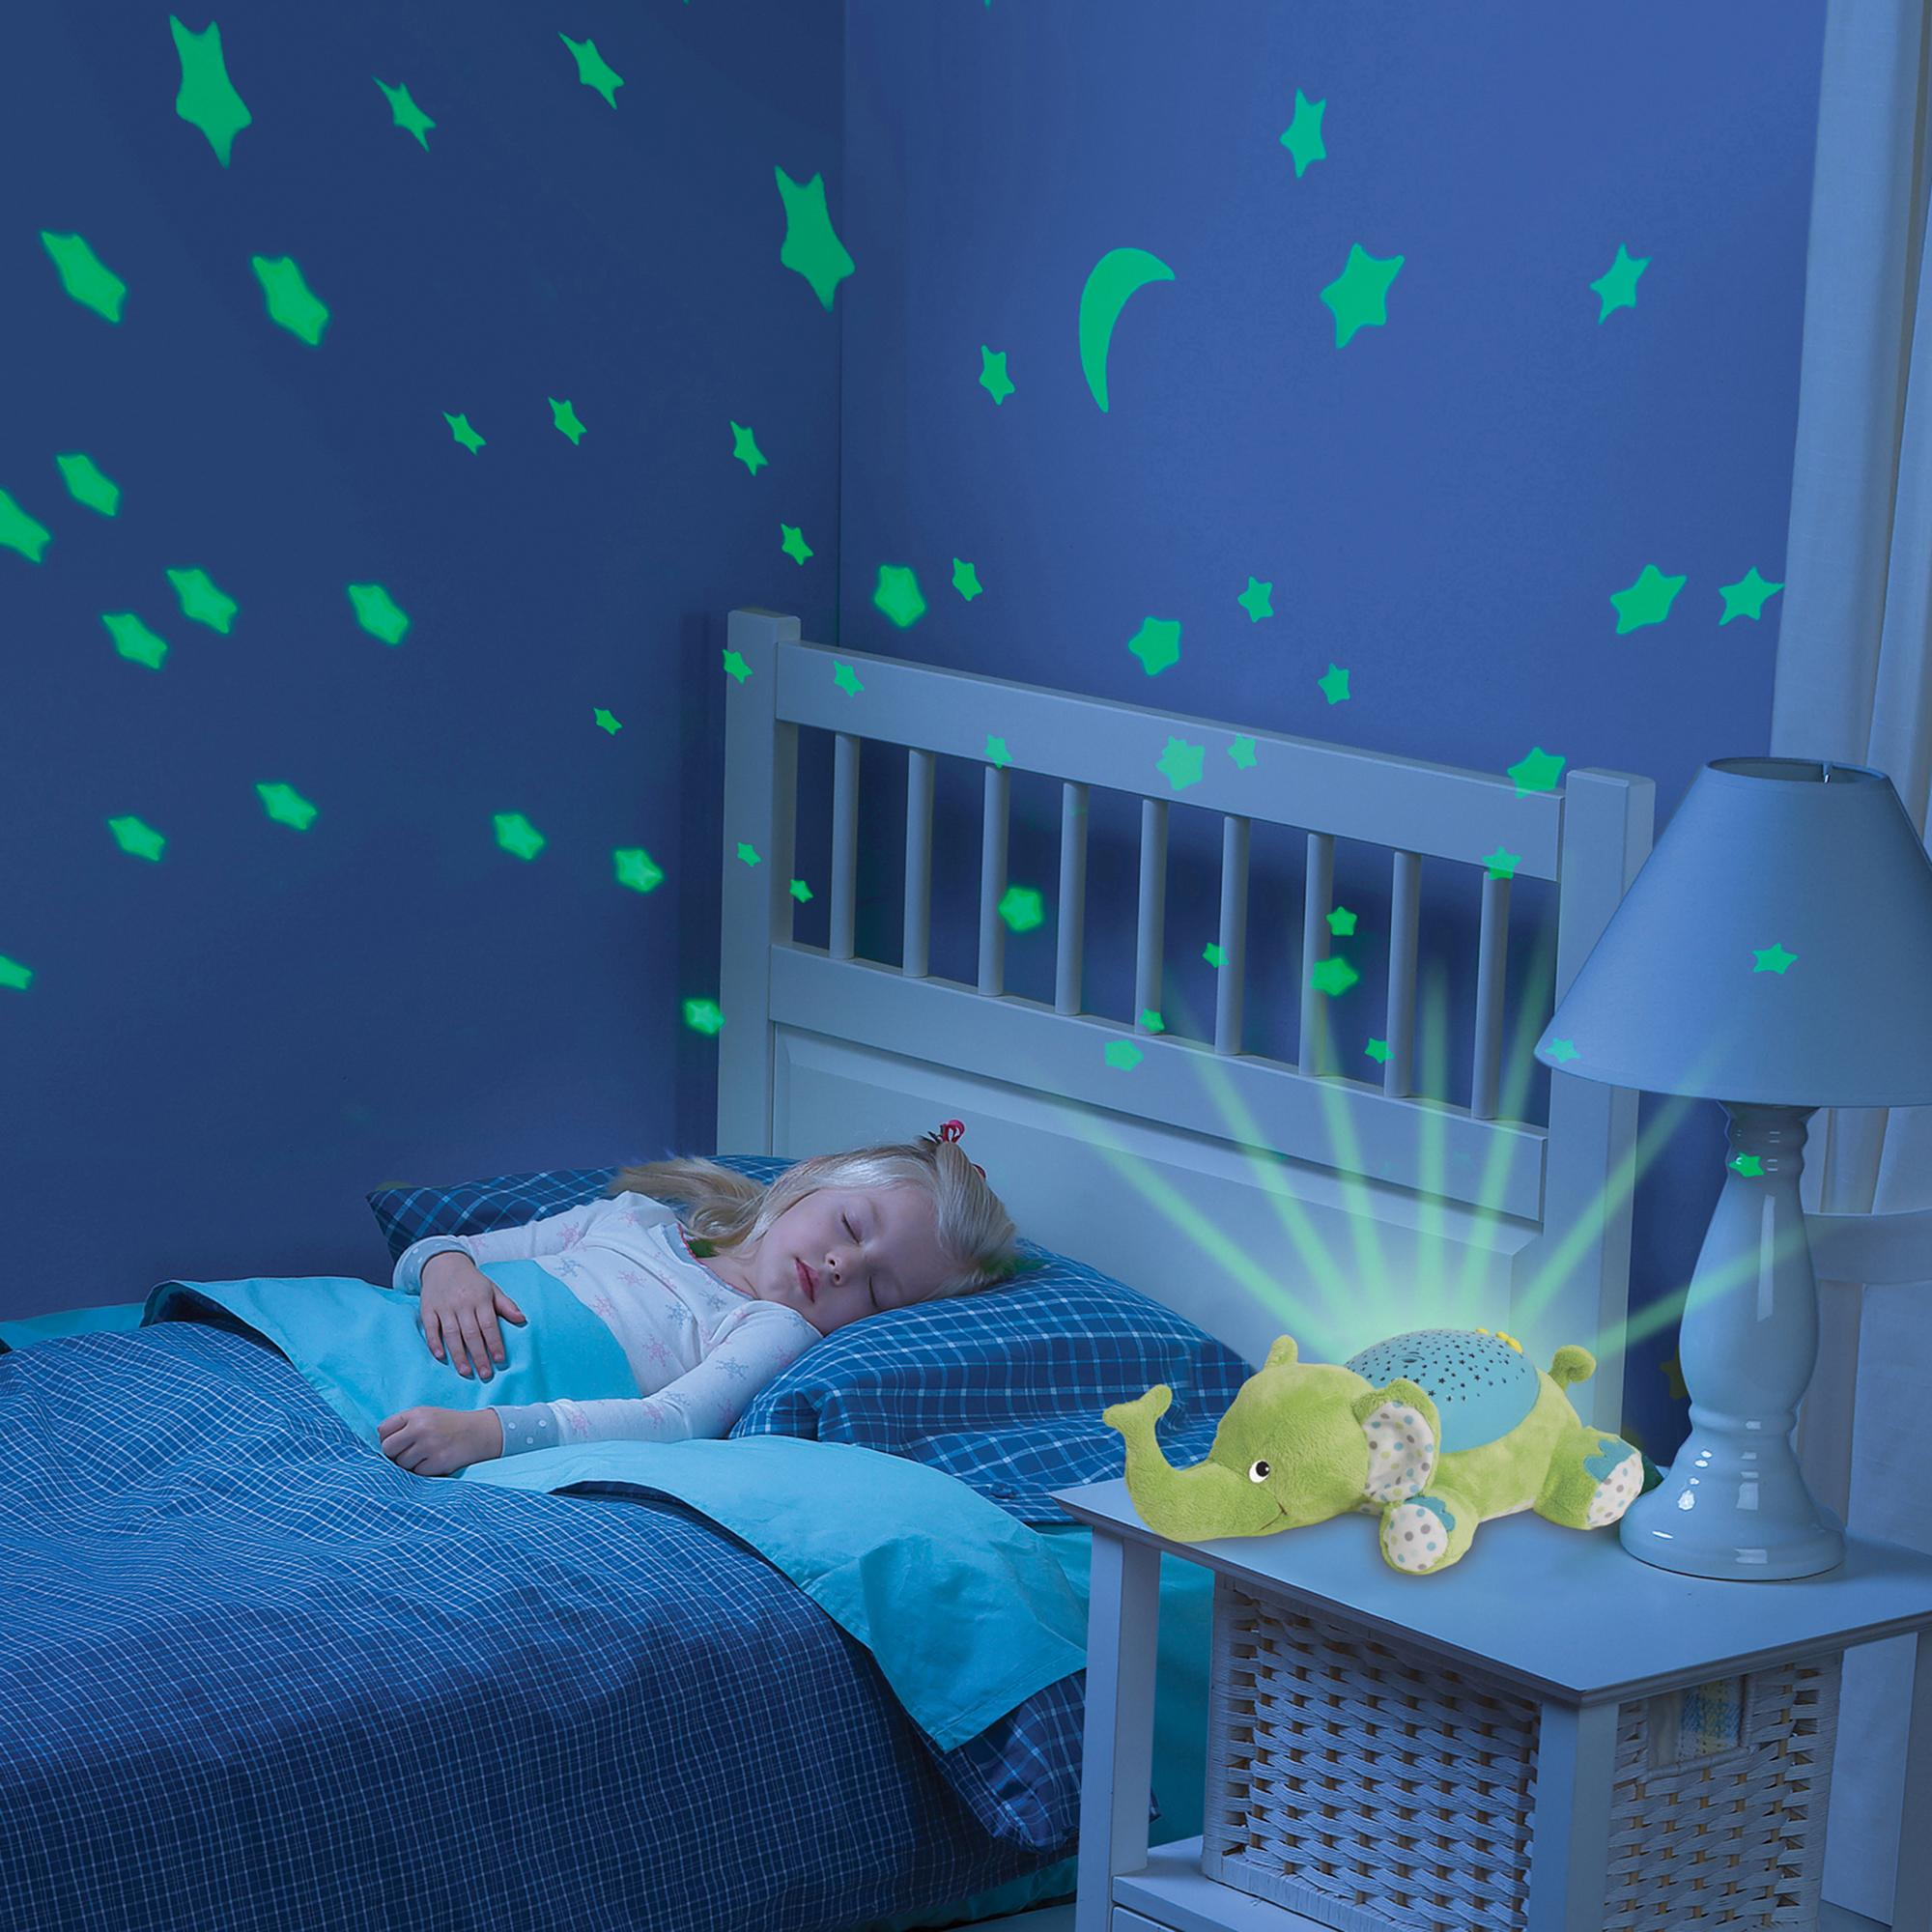 Summer infant slumber buddies soother green - Lamparas para habitaciones infantiles ...